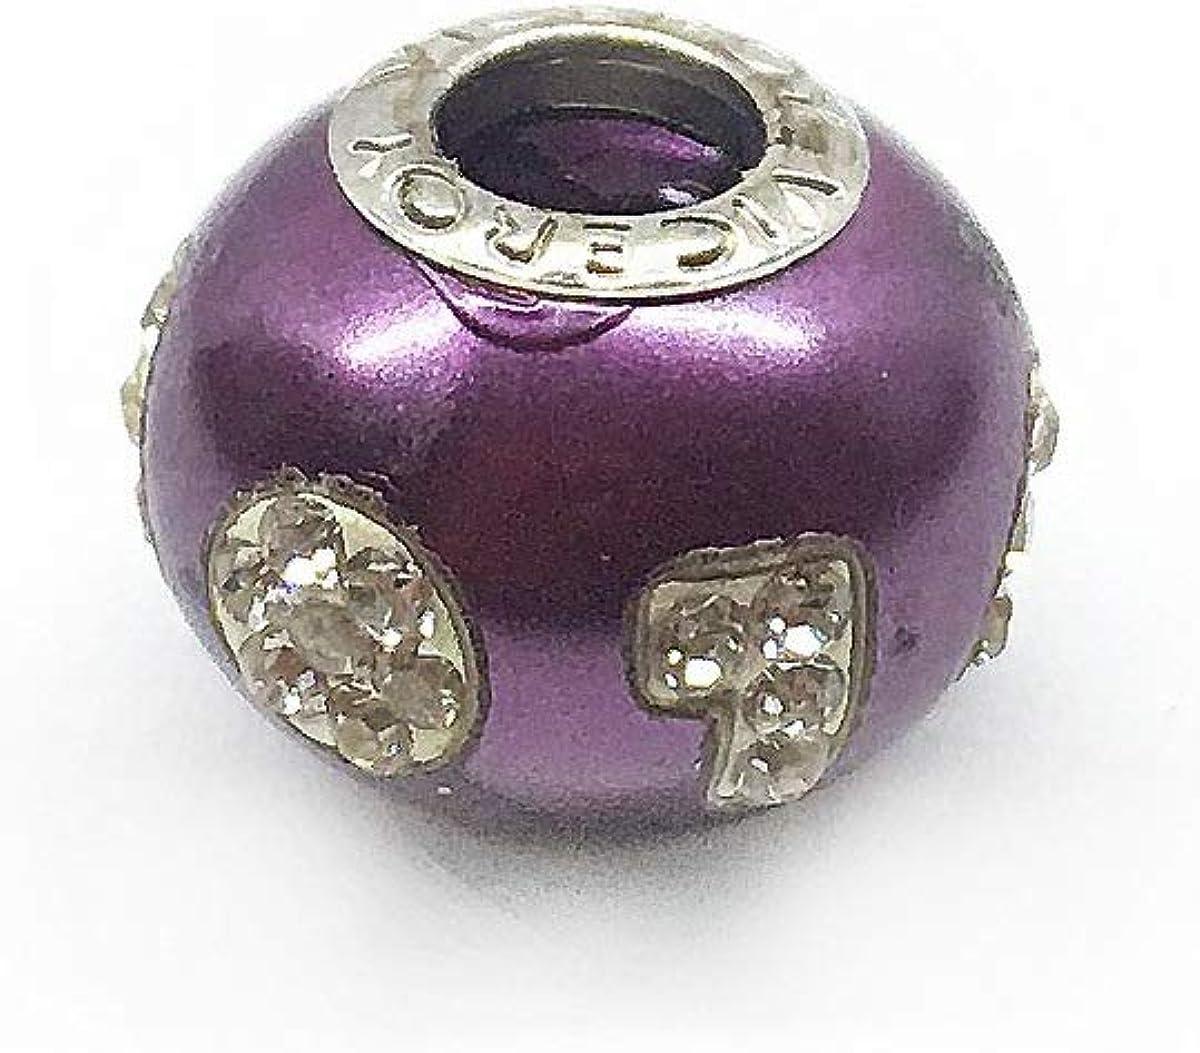 Viceroy VMB0031-27 Pendant Purple 925 Sterling Silver Woman 1CM Size